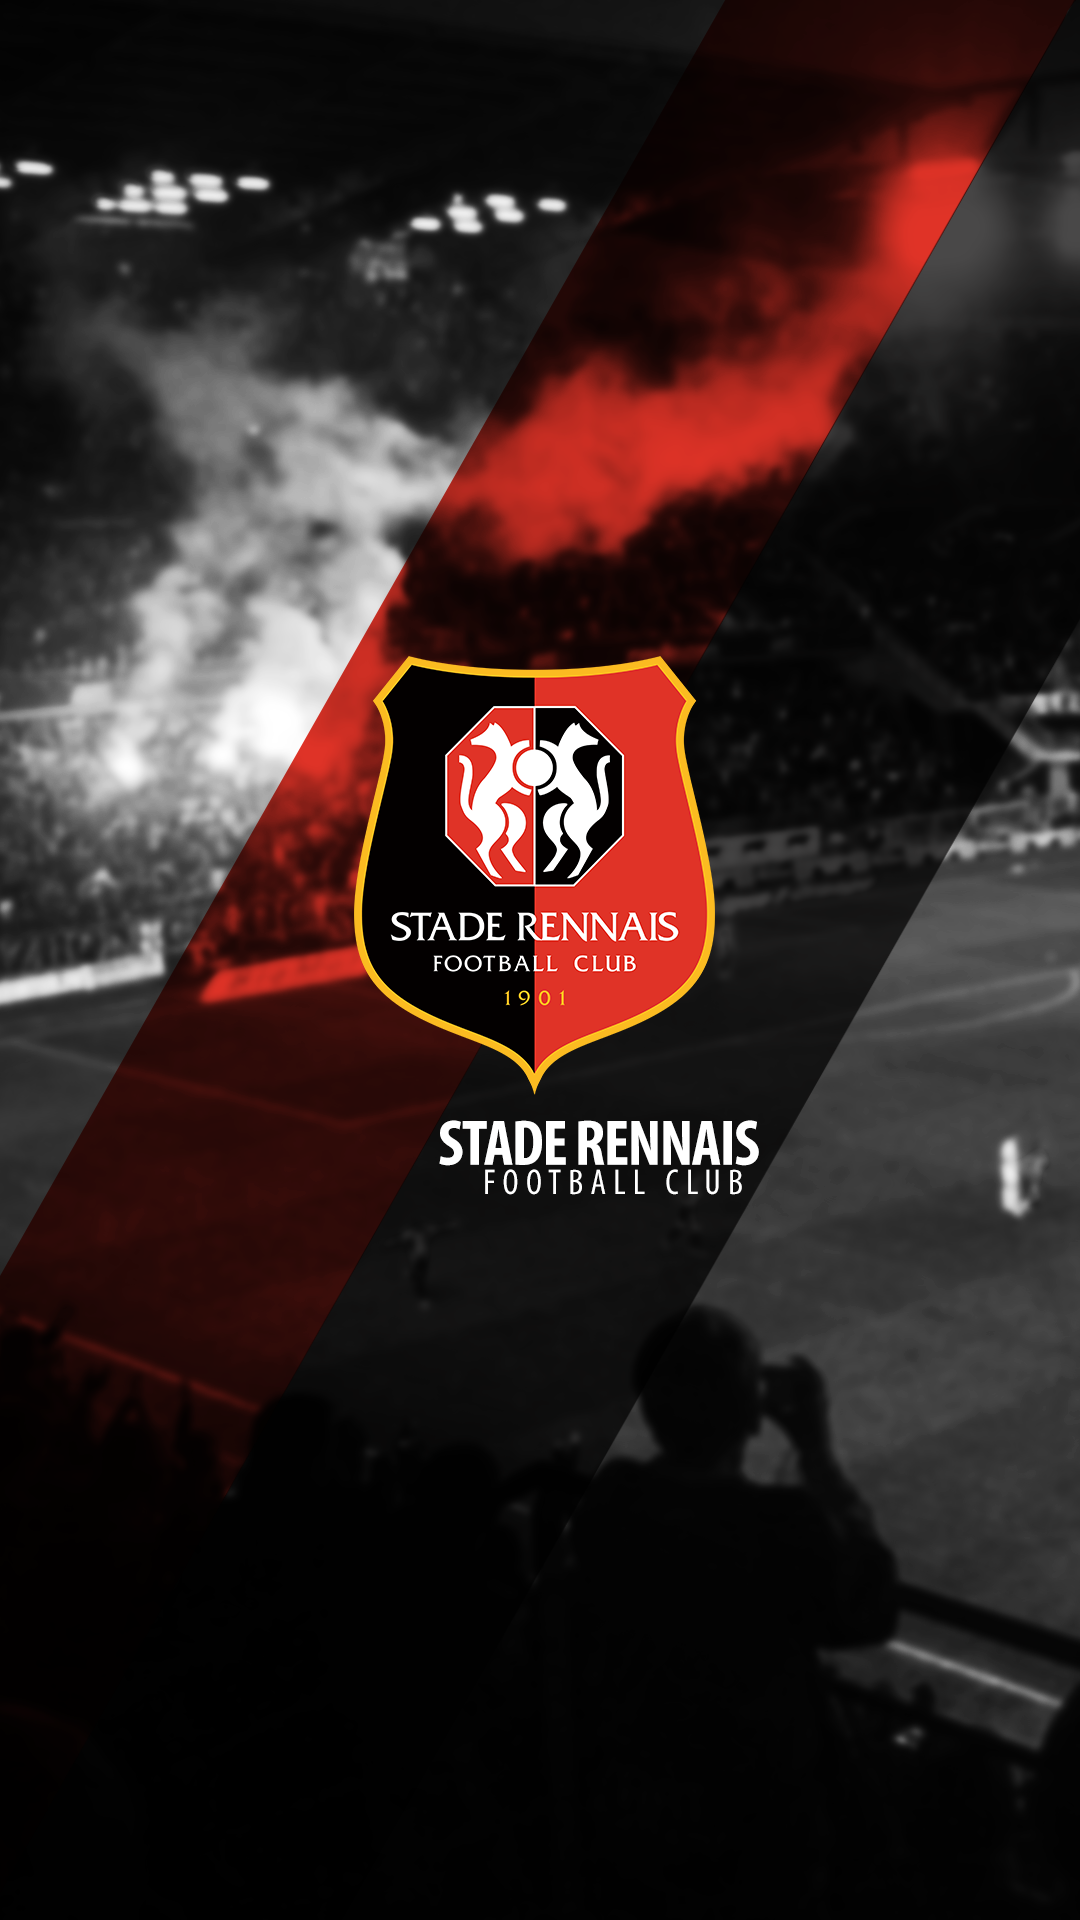 Stade Rennais Of France Wallpaper Stade Rennais Stade Football